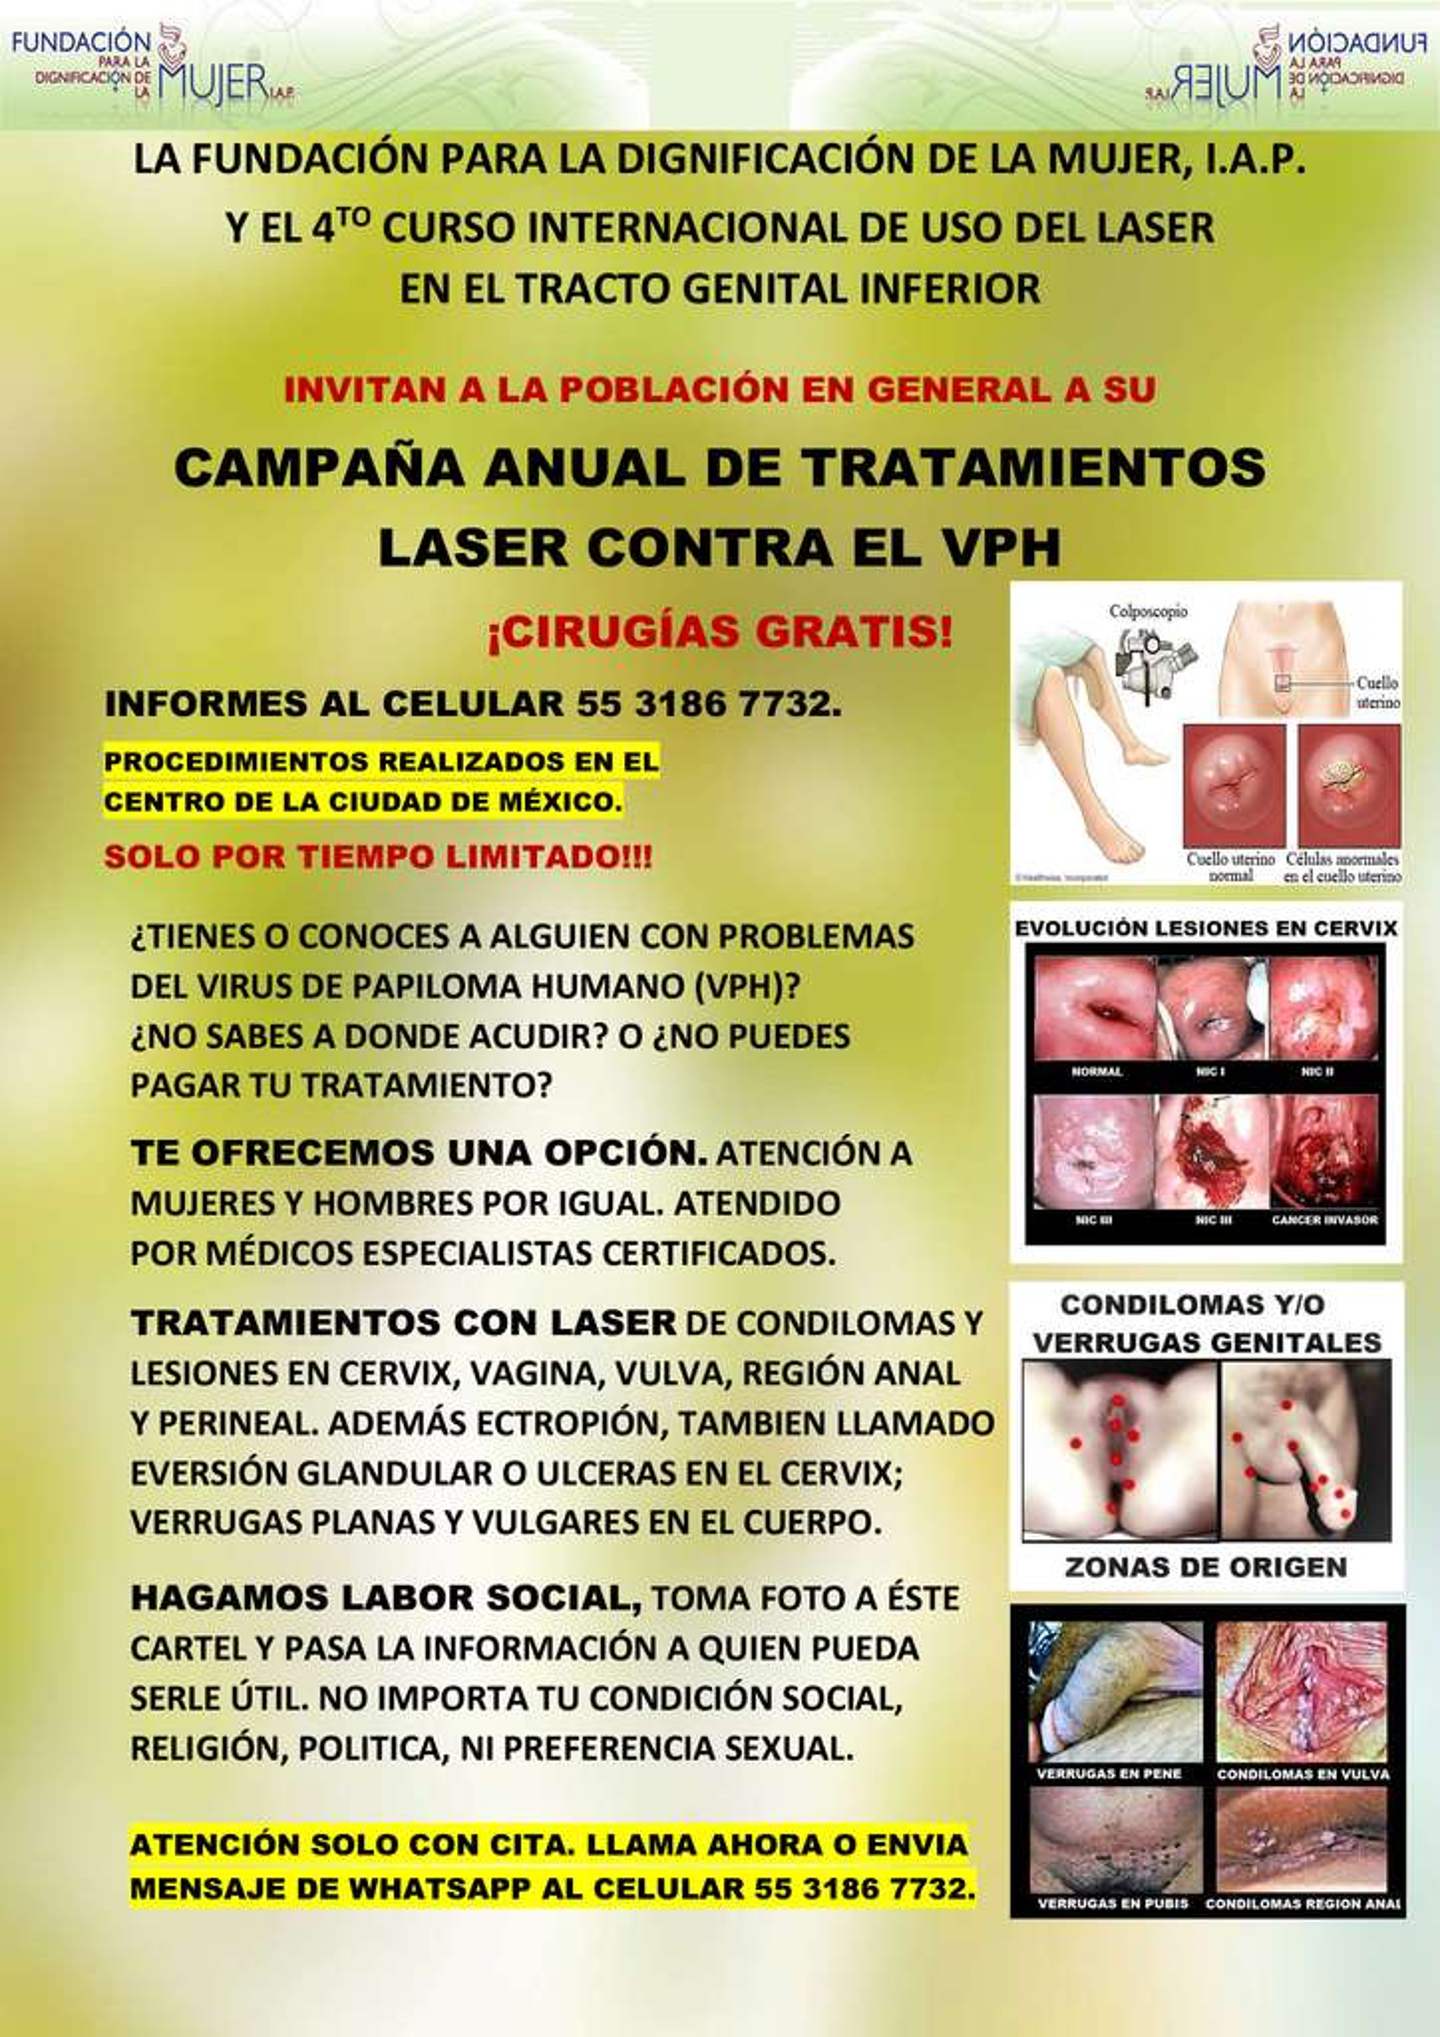 Virus papiloma para hombres, Hpv en hombres deteccion - p5net.ro